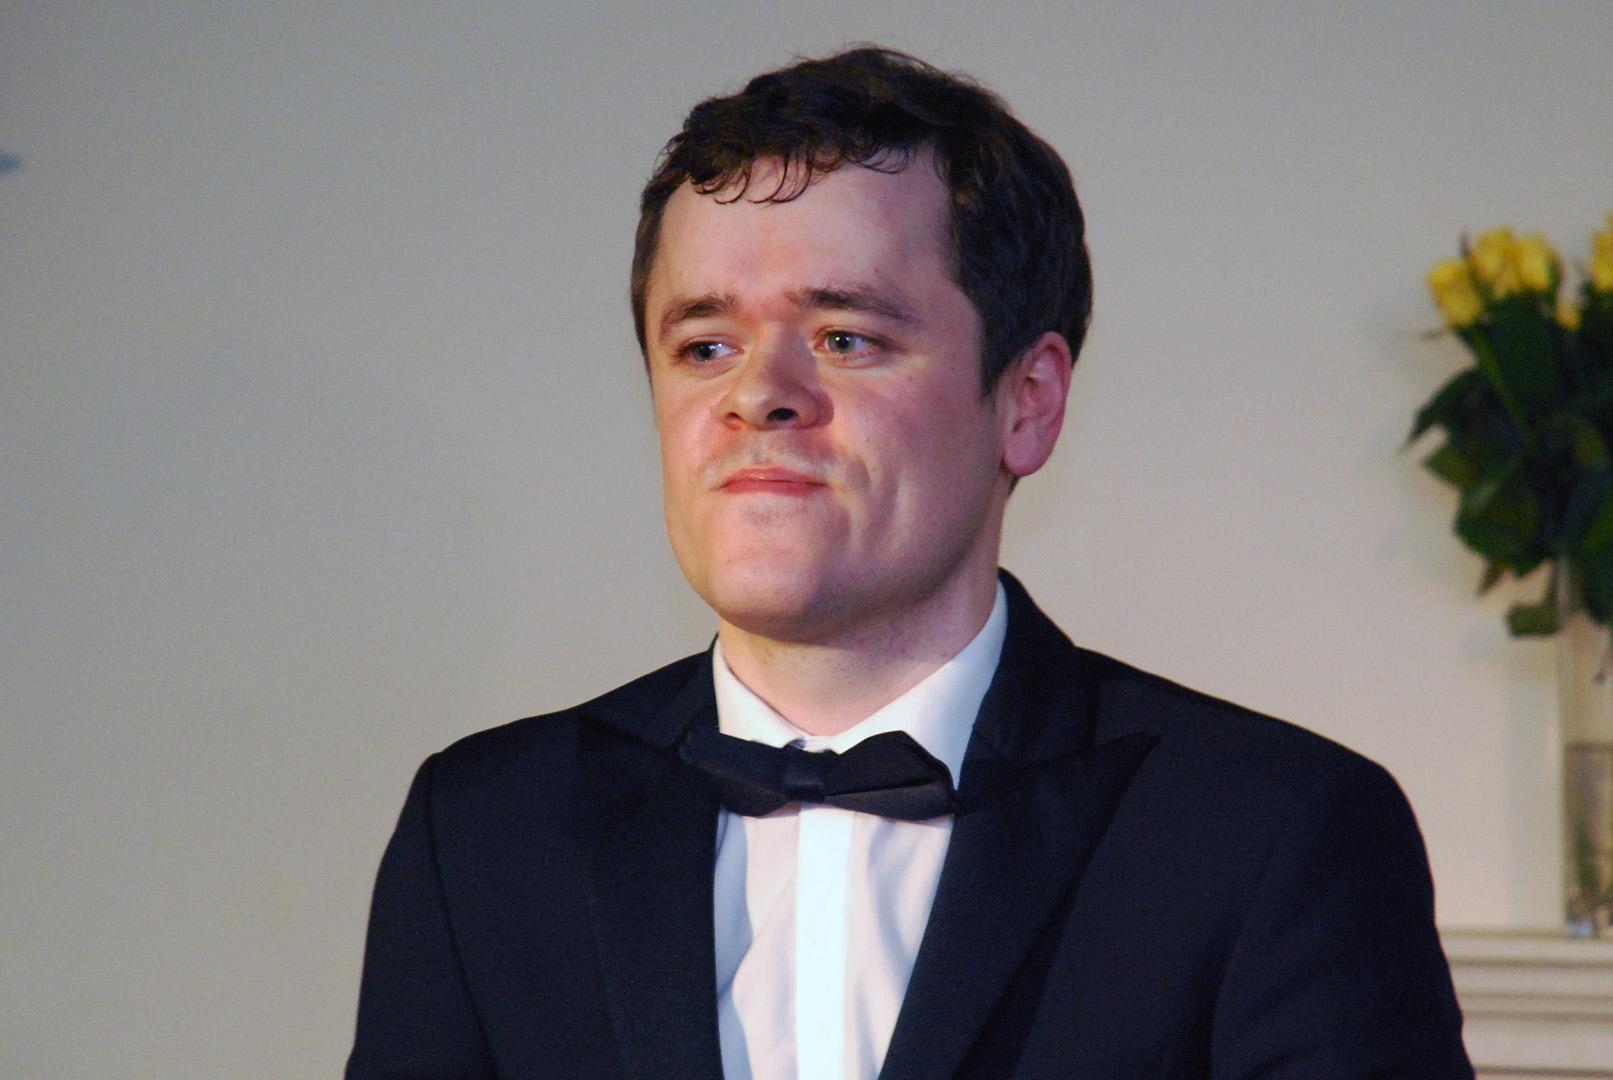 Benjamin Grosvenor at Breinton